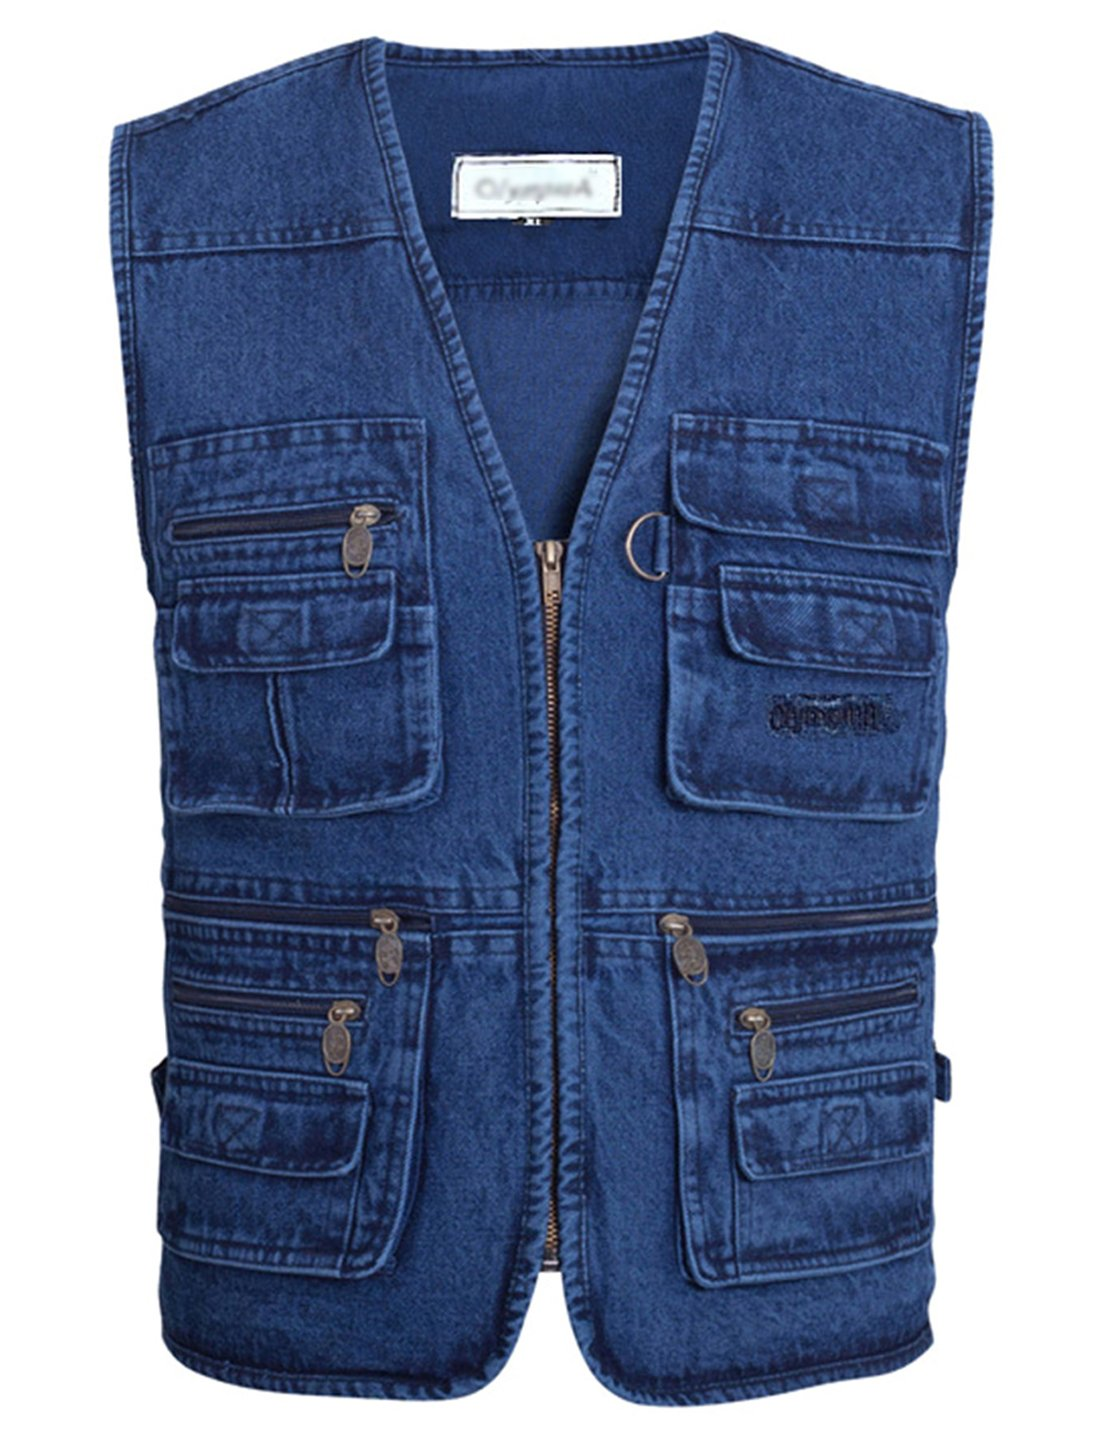 Gihuo Men's Casual Outdoor Leisure Lightweight Pockets Fishing Photo Journalist Denim Vest Plus Size (L, Denim)